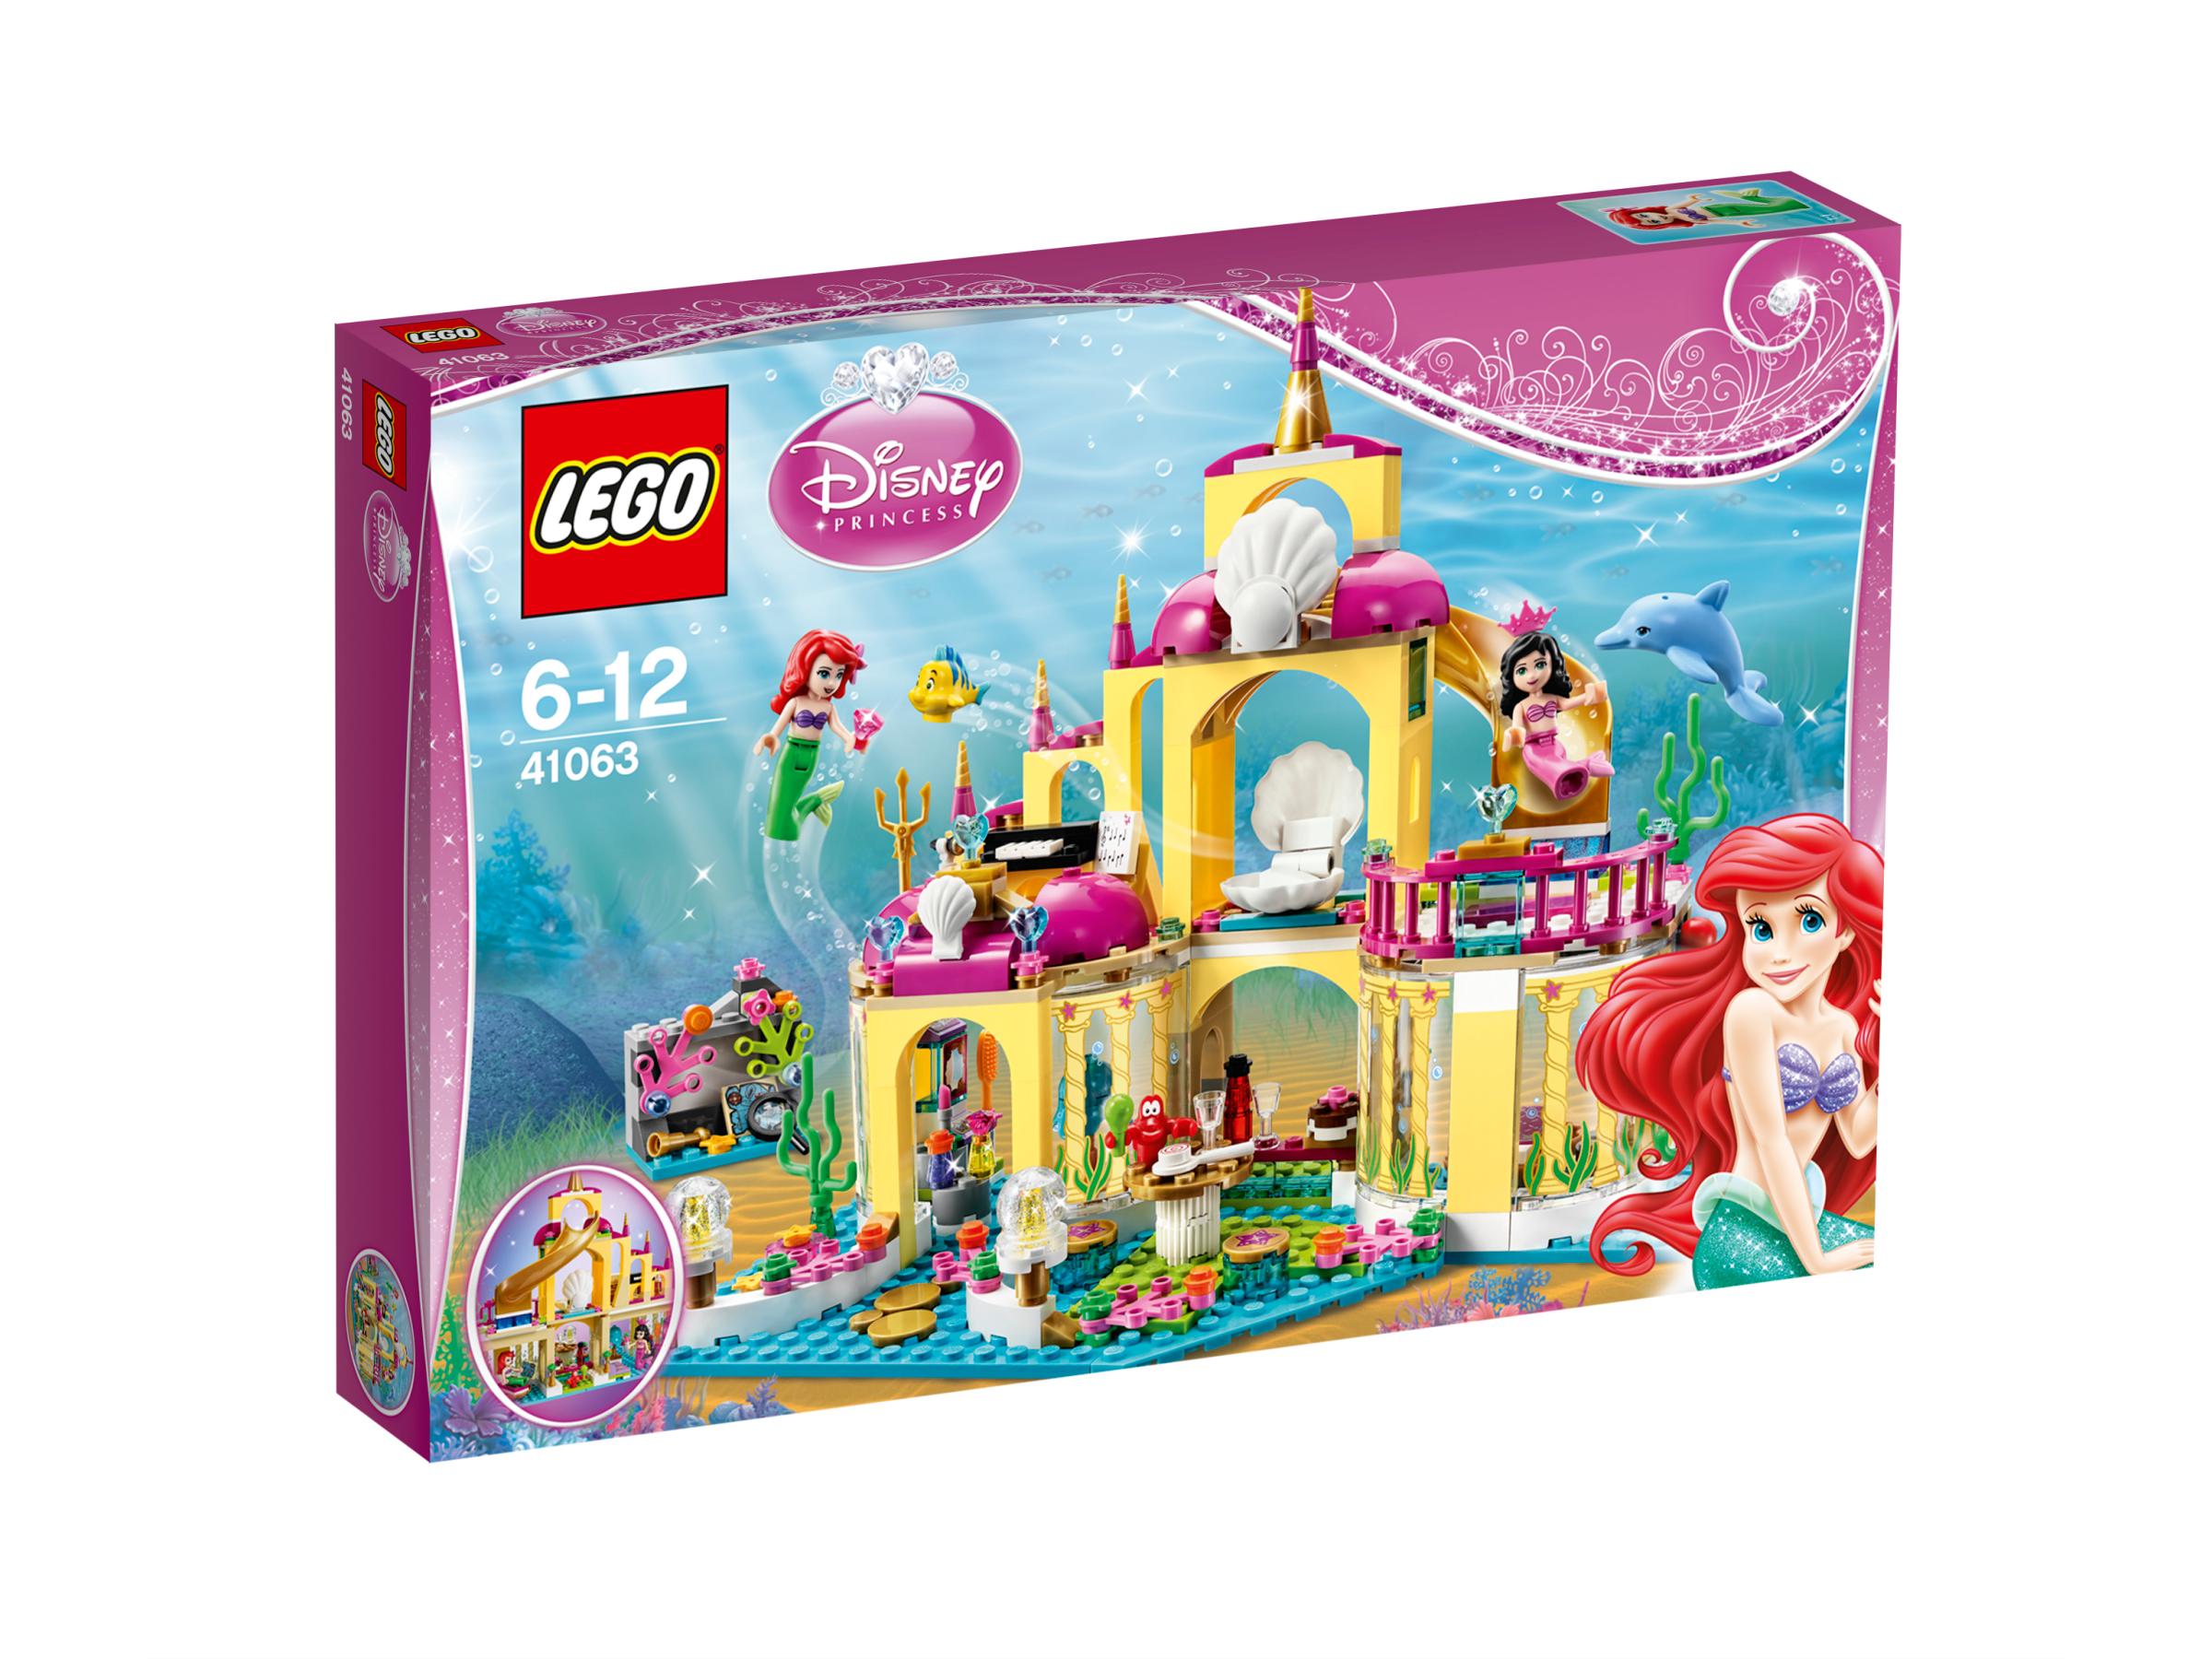 Le royaume sous-marin d'Ariel - LEGO® Disney Princess - 41063